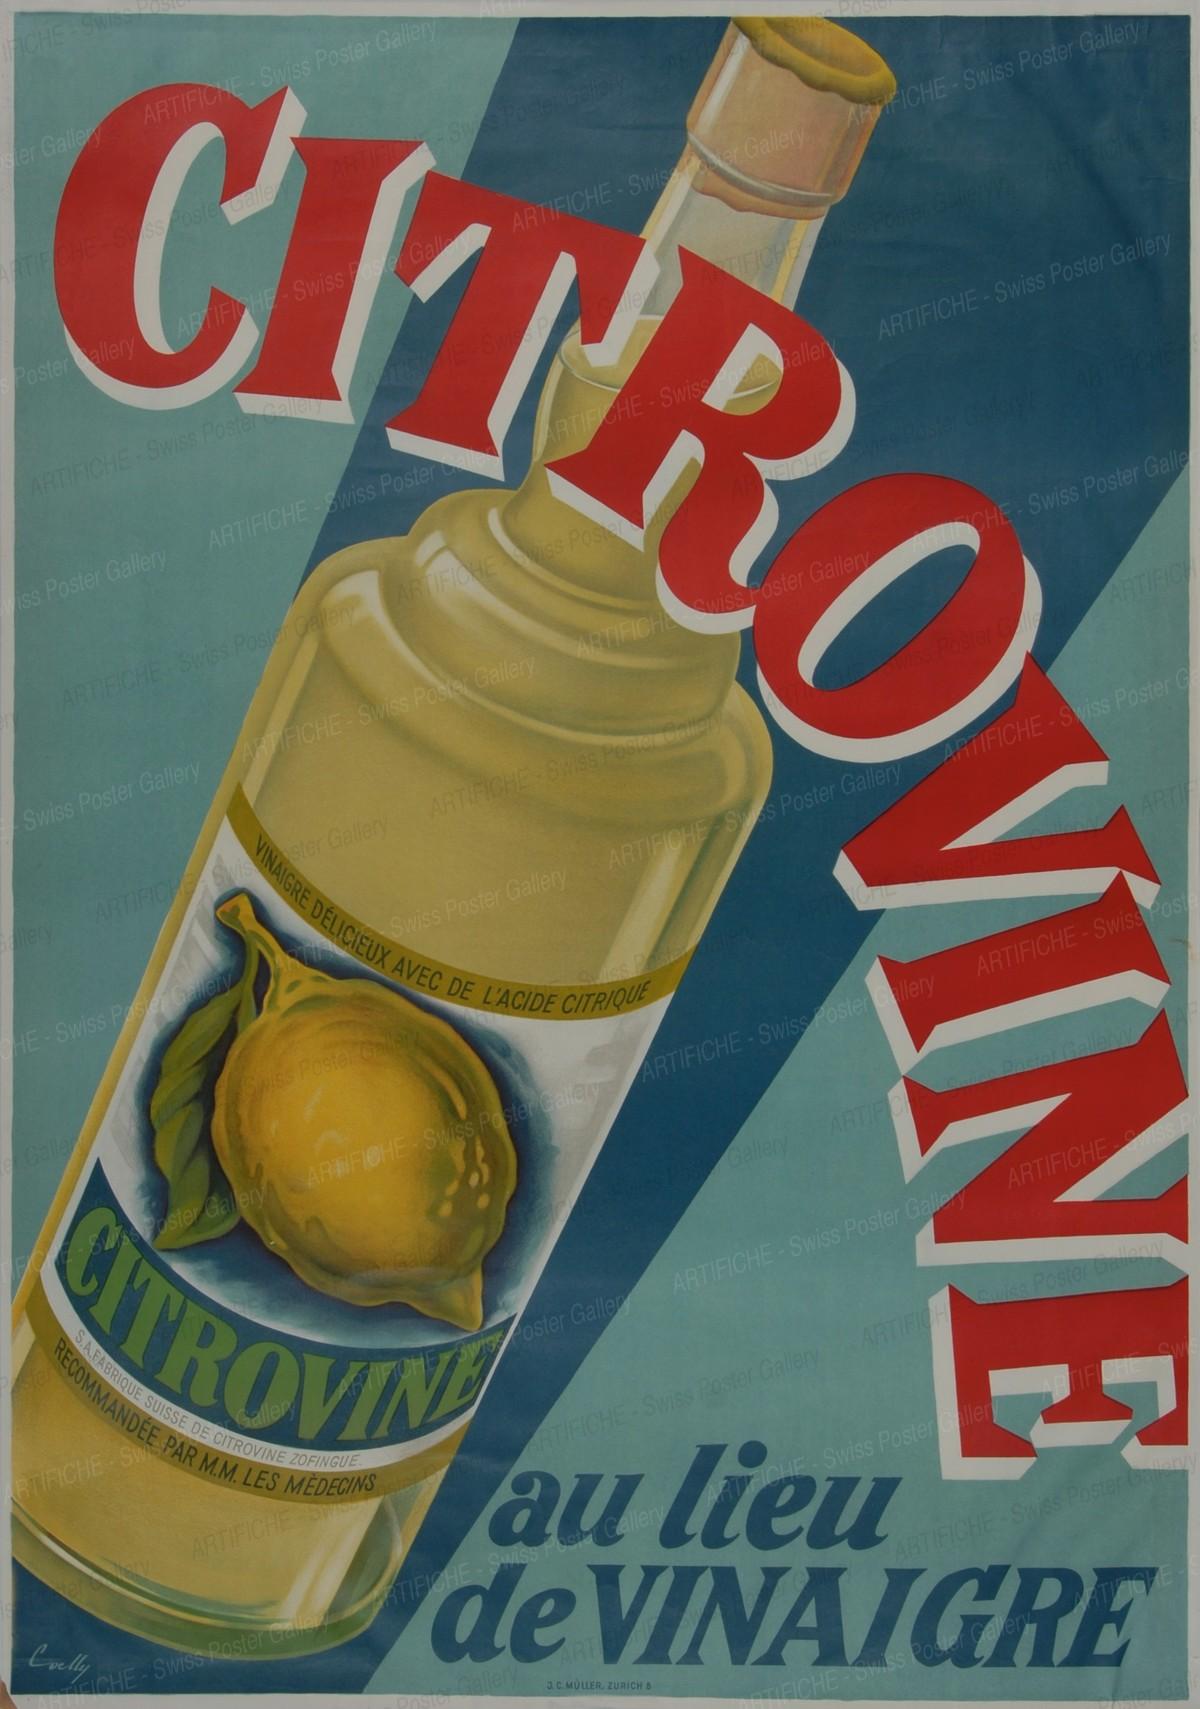 Citrovine instead of vinegar, Hermann Alfred Koelliker